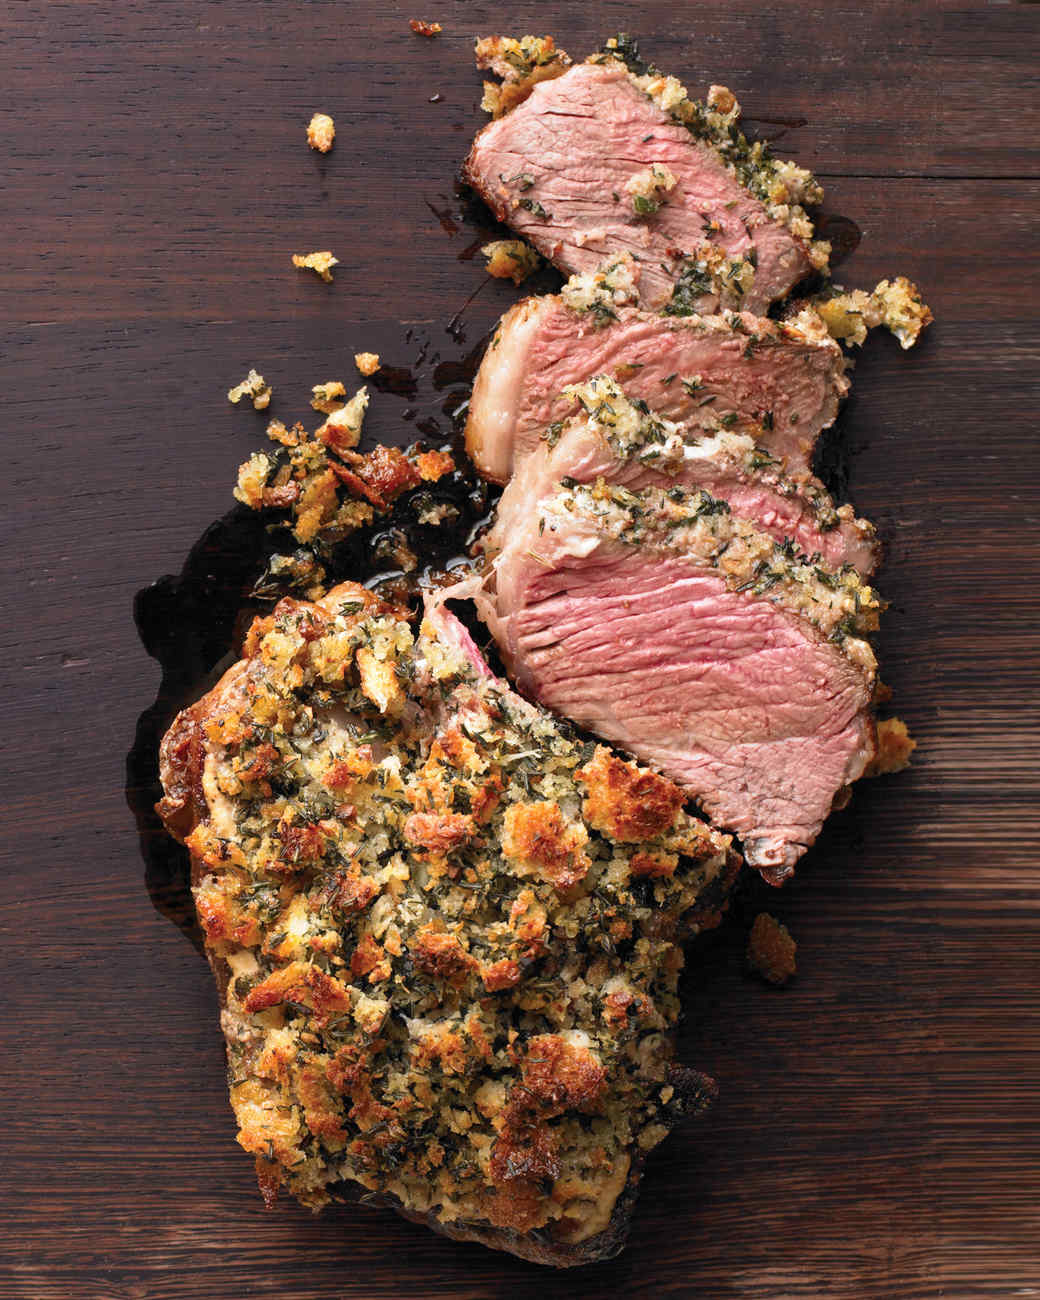 Rib Roast with Herb Crust